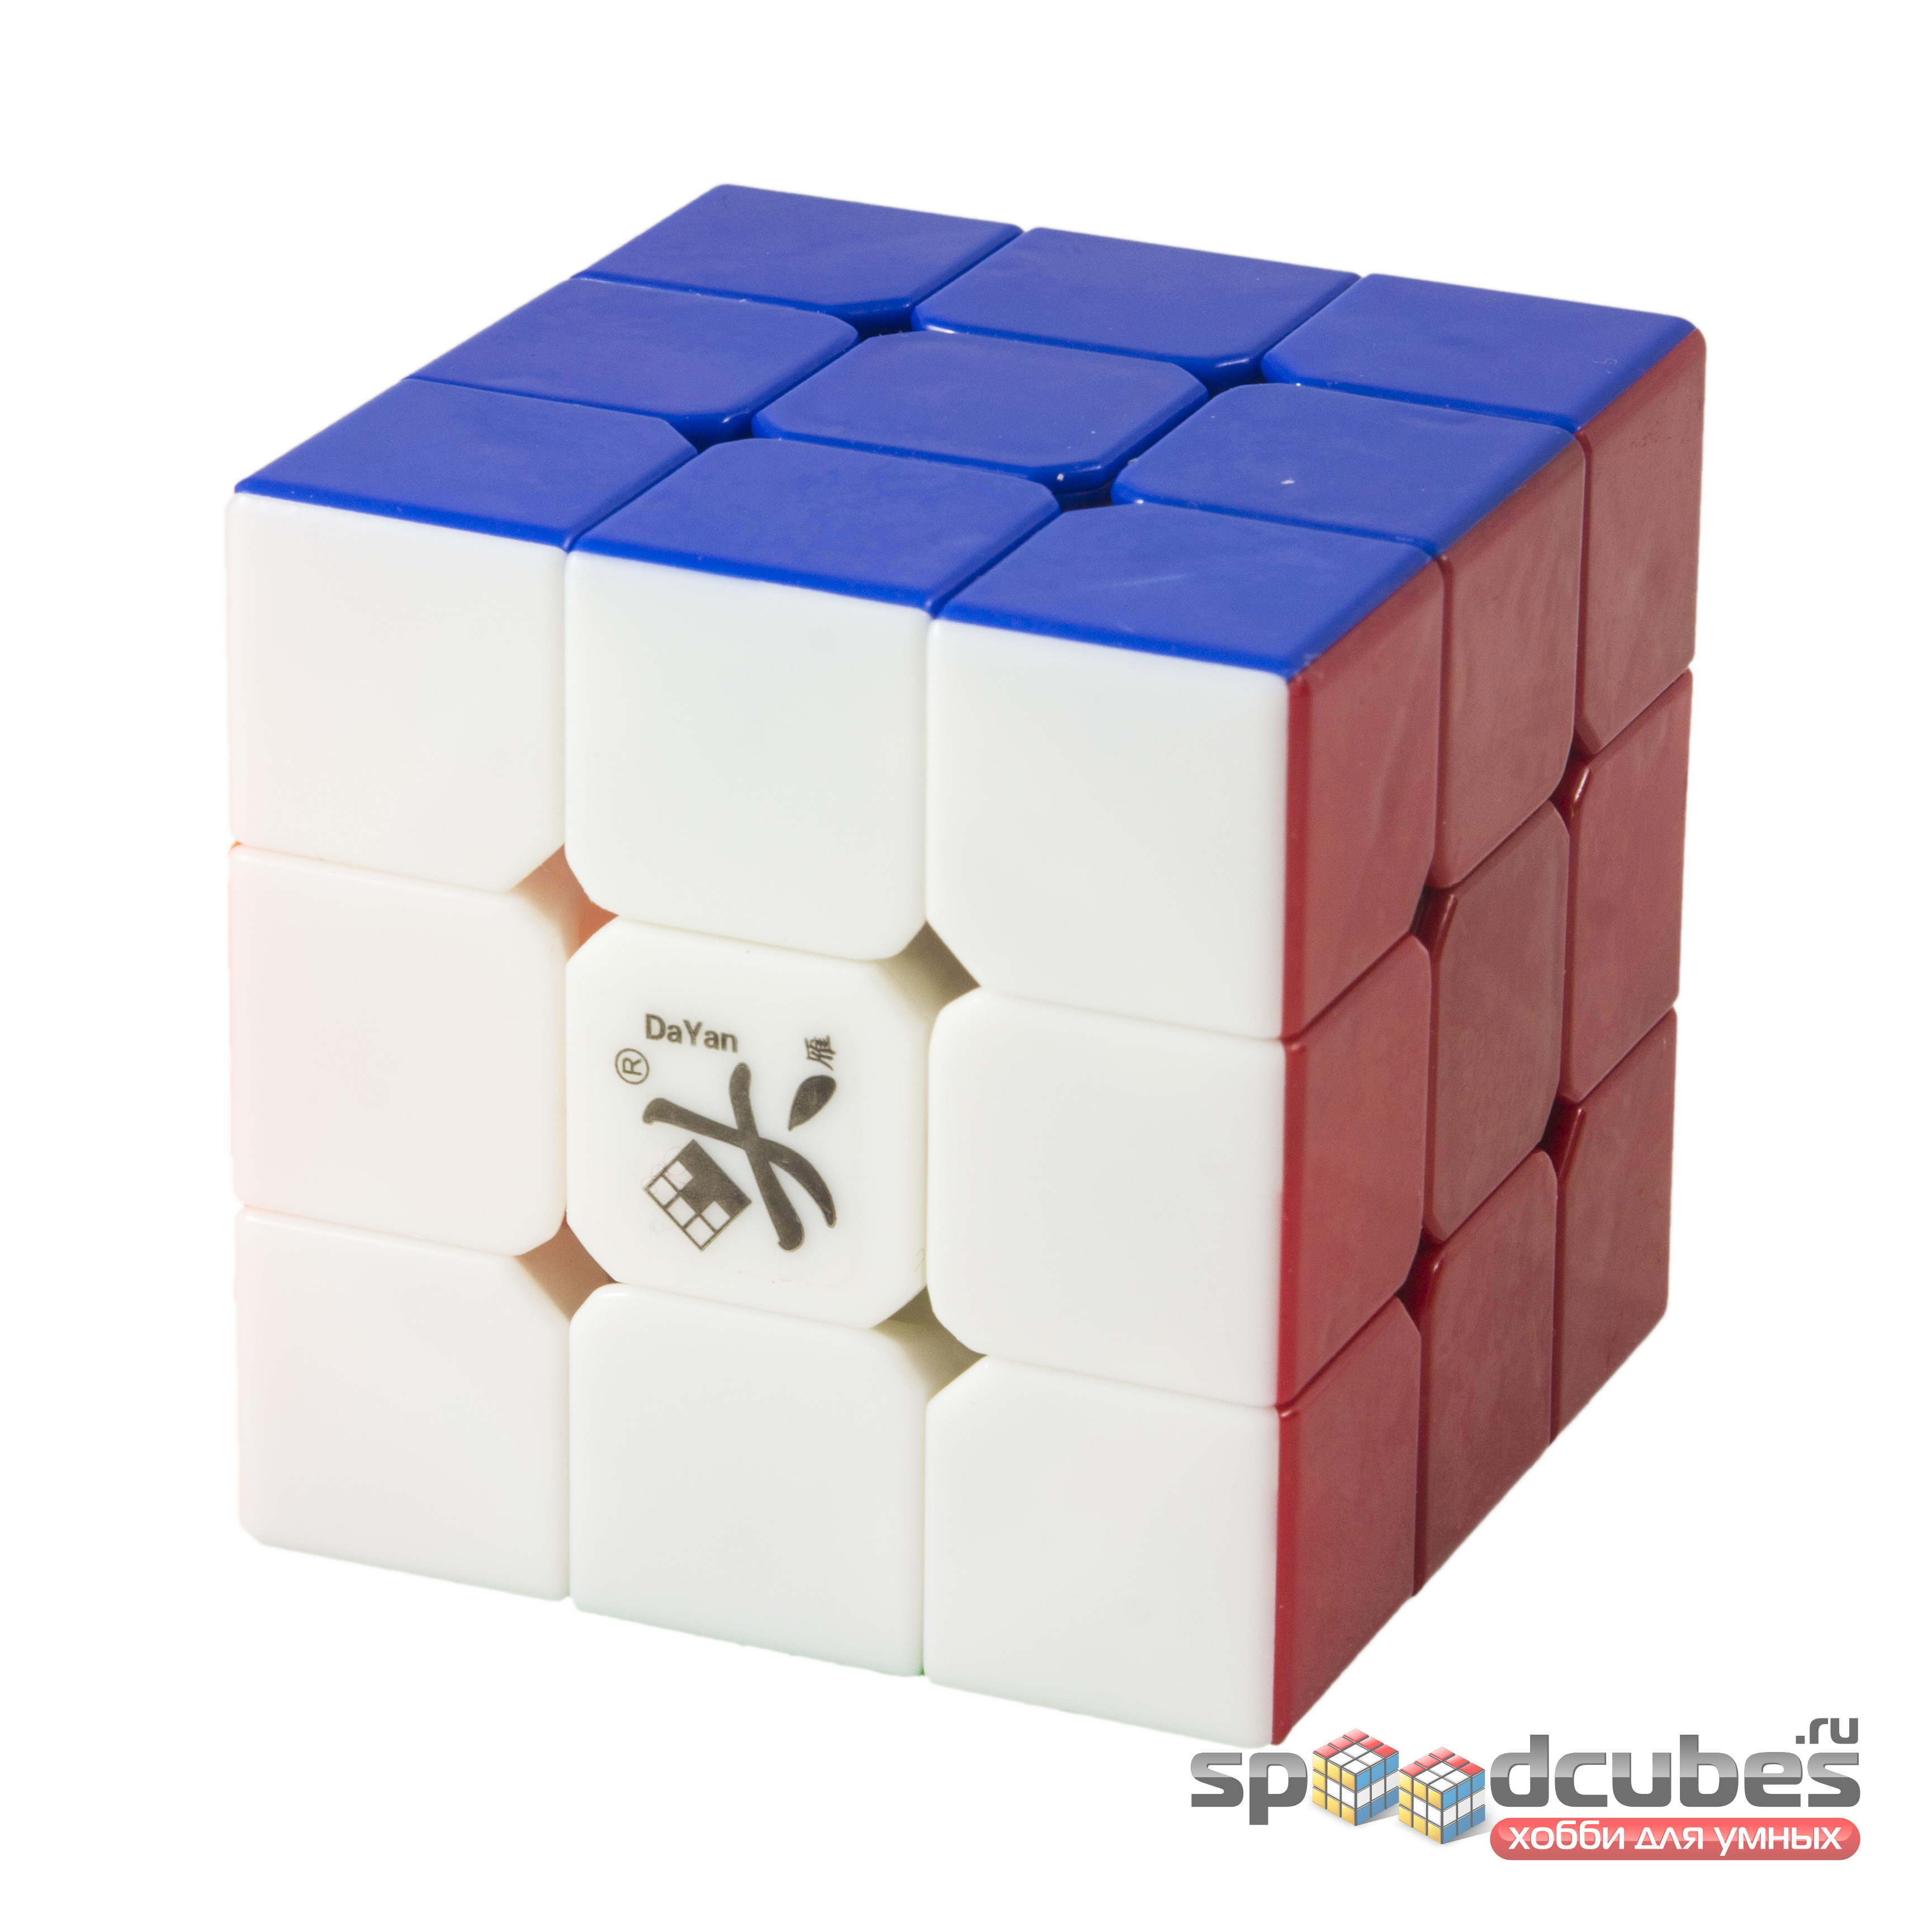 DaYan 5 Zhanchi 3x3x3  (цв)